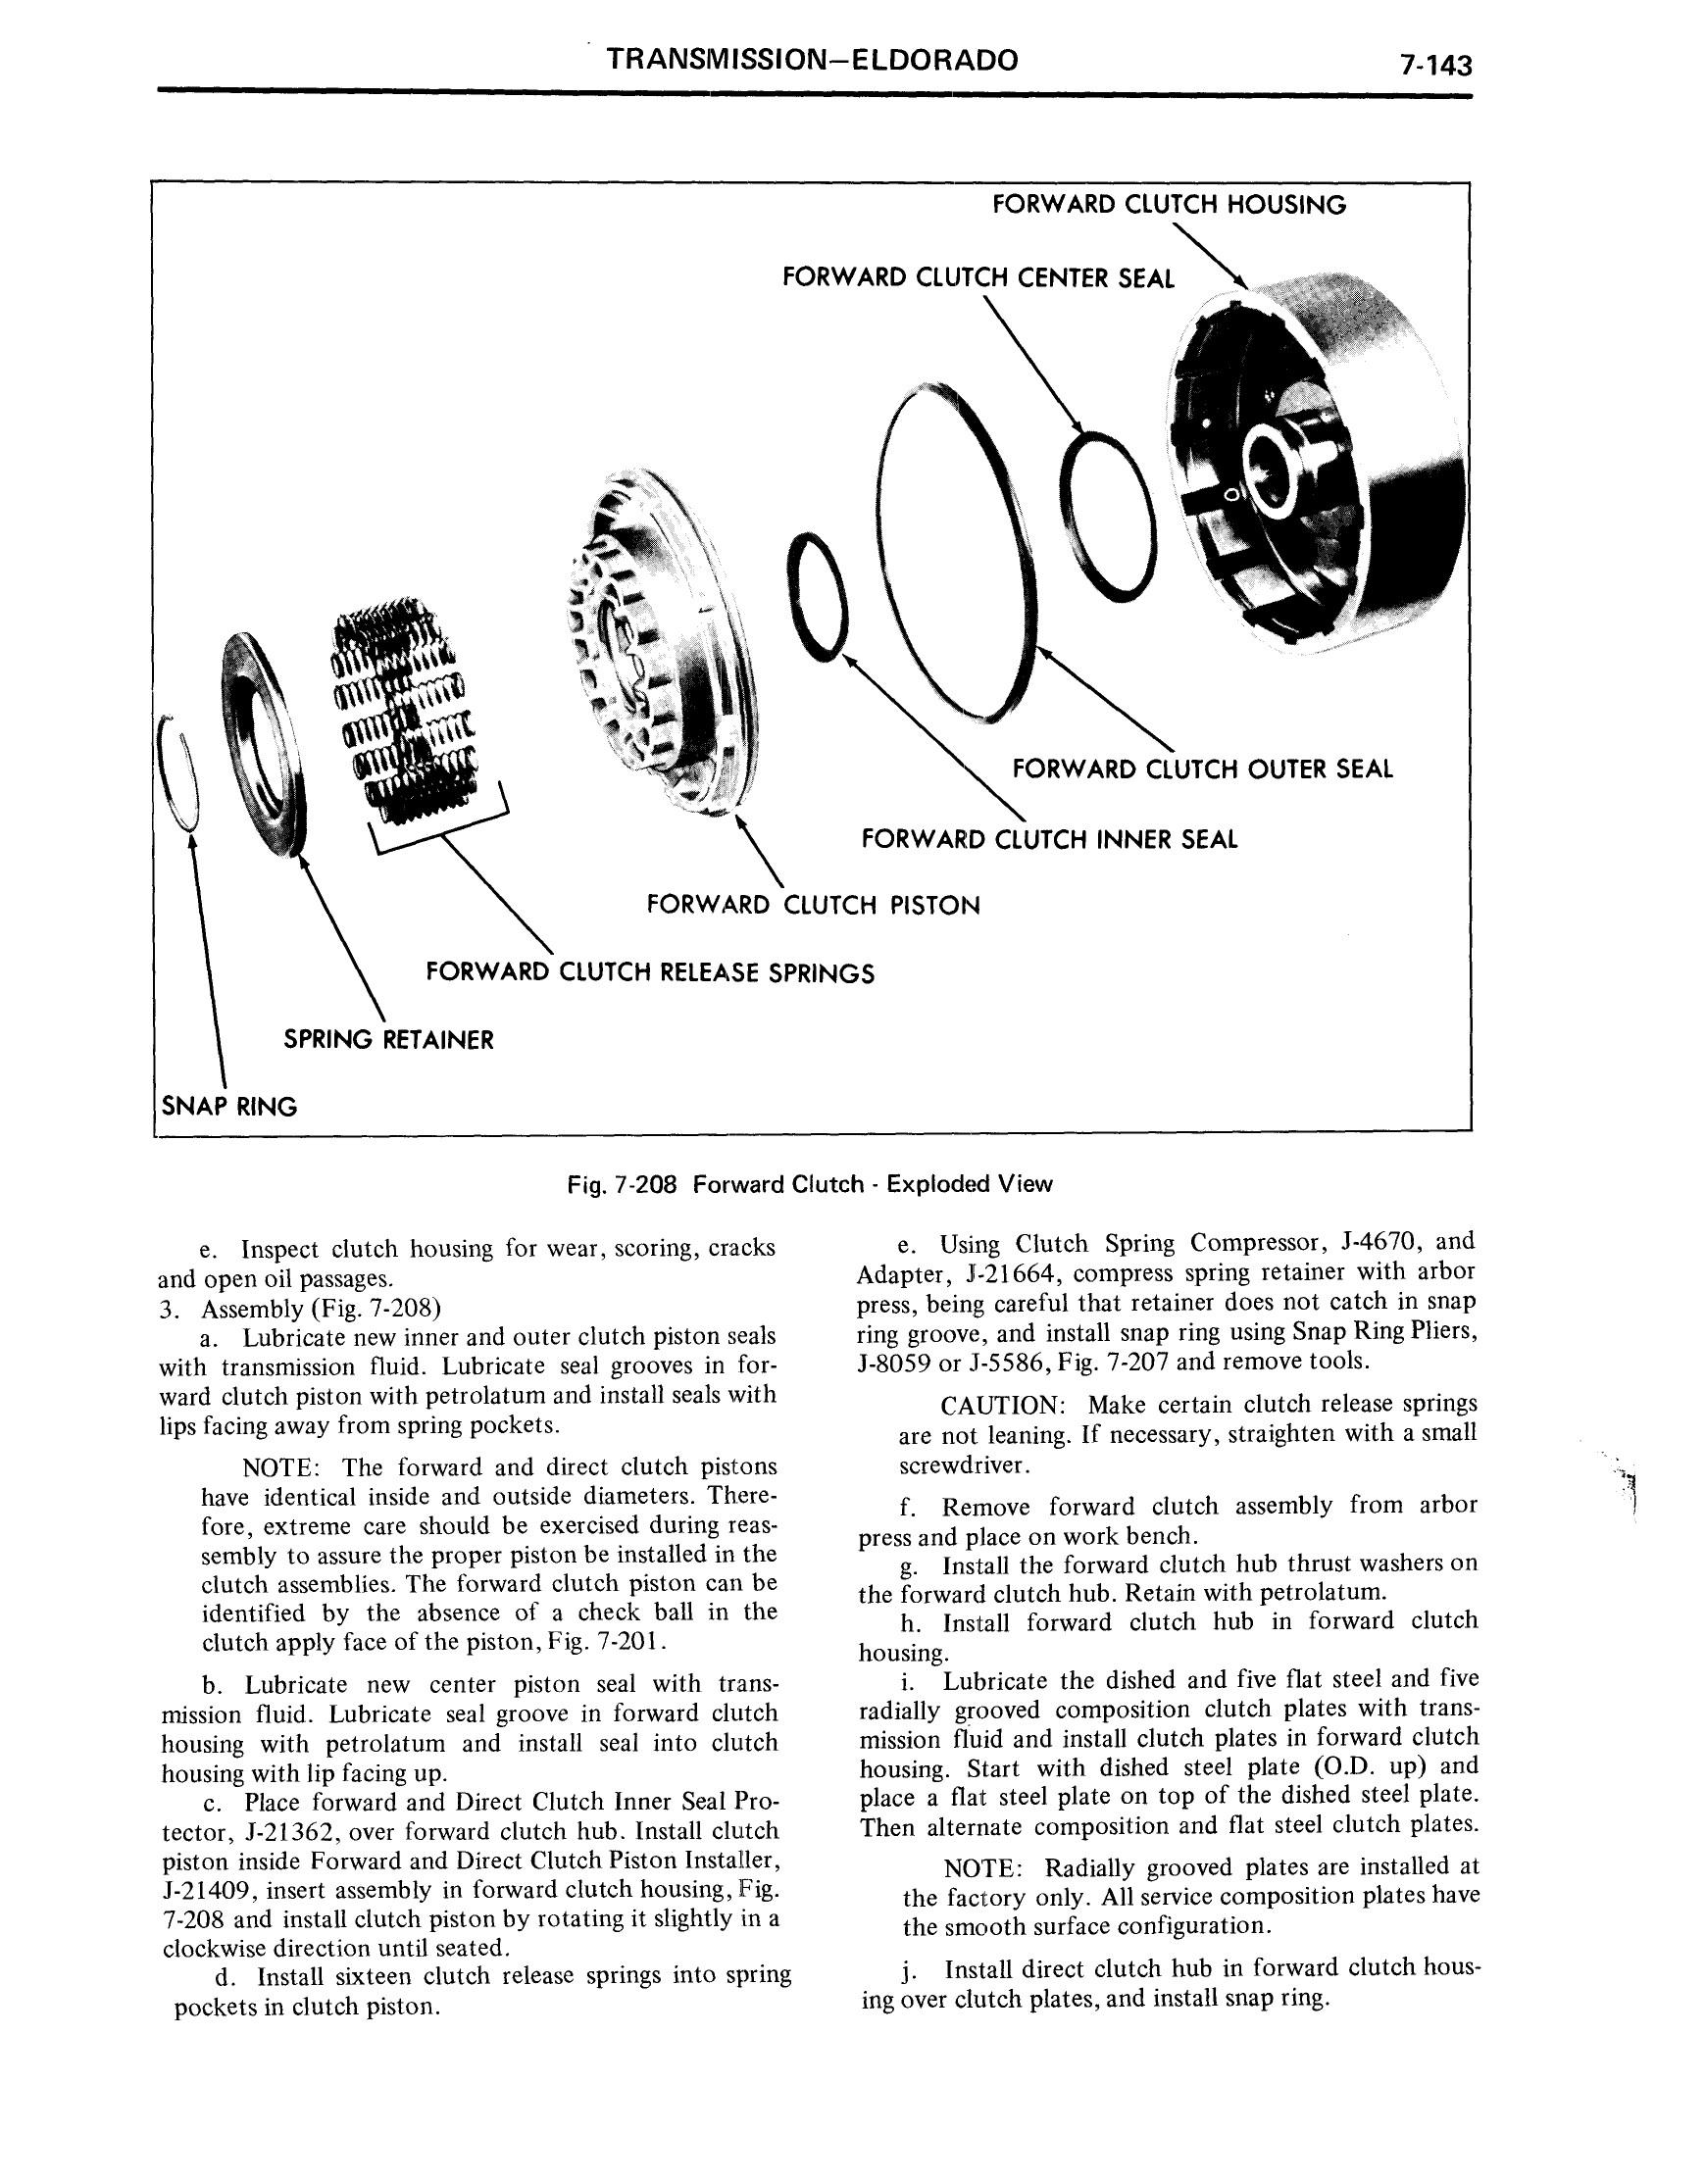 1971 Cadillac Shop Manual- Transmission Page 143 of 156